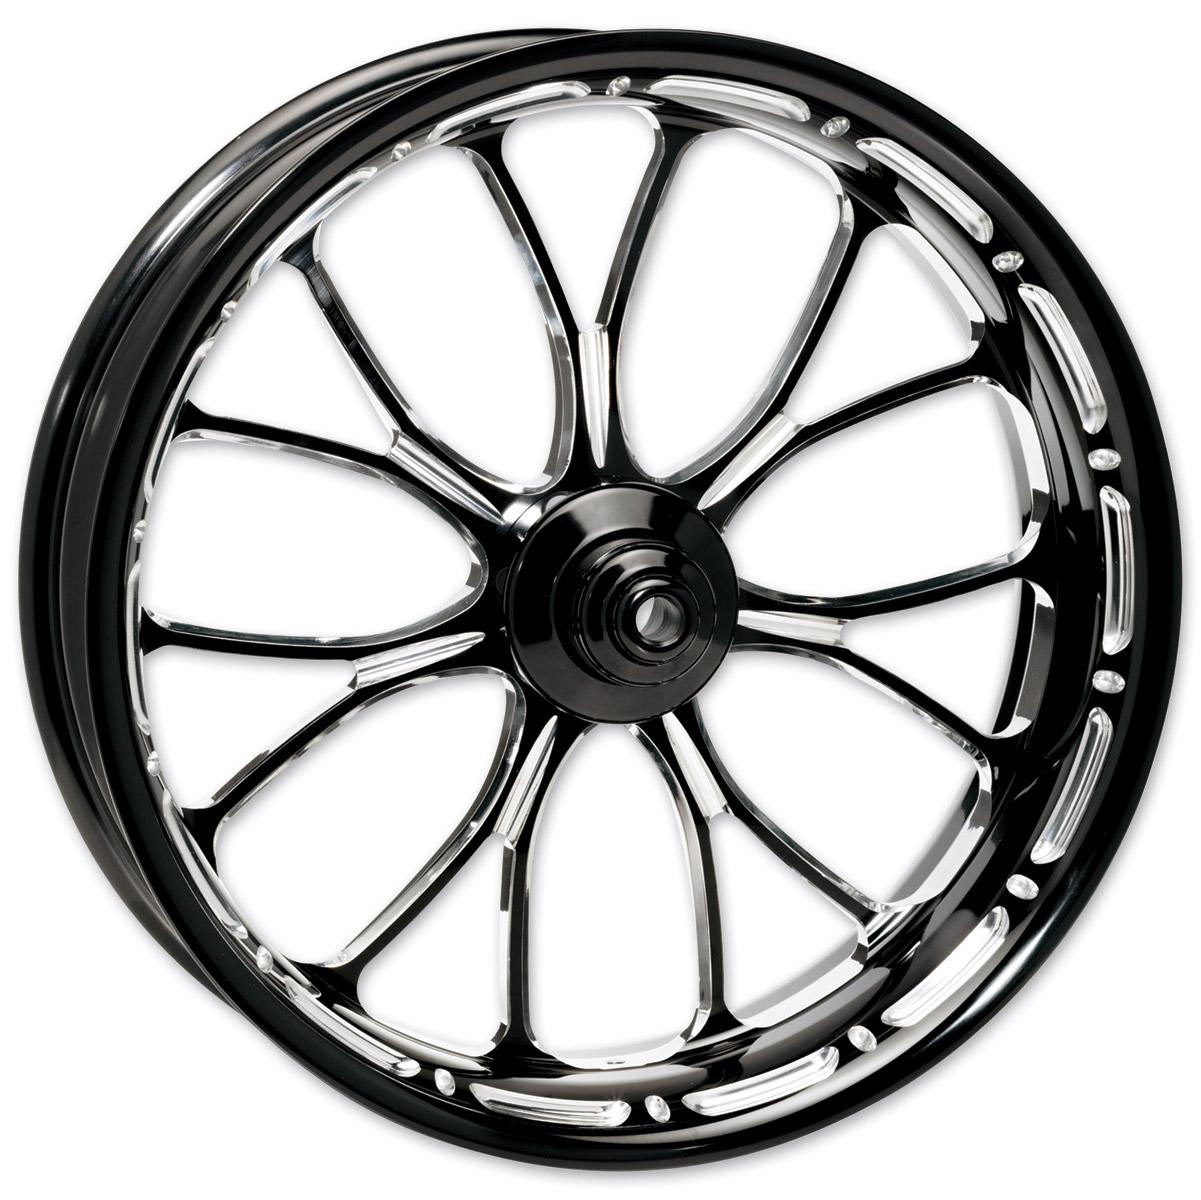 Performance Machine Heathen Rear Wheel 17″ X 6″ Contrast Cut Platinum